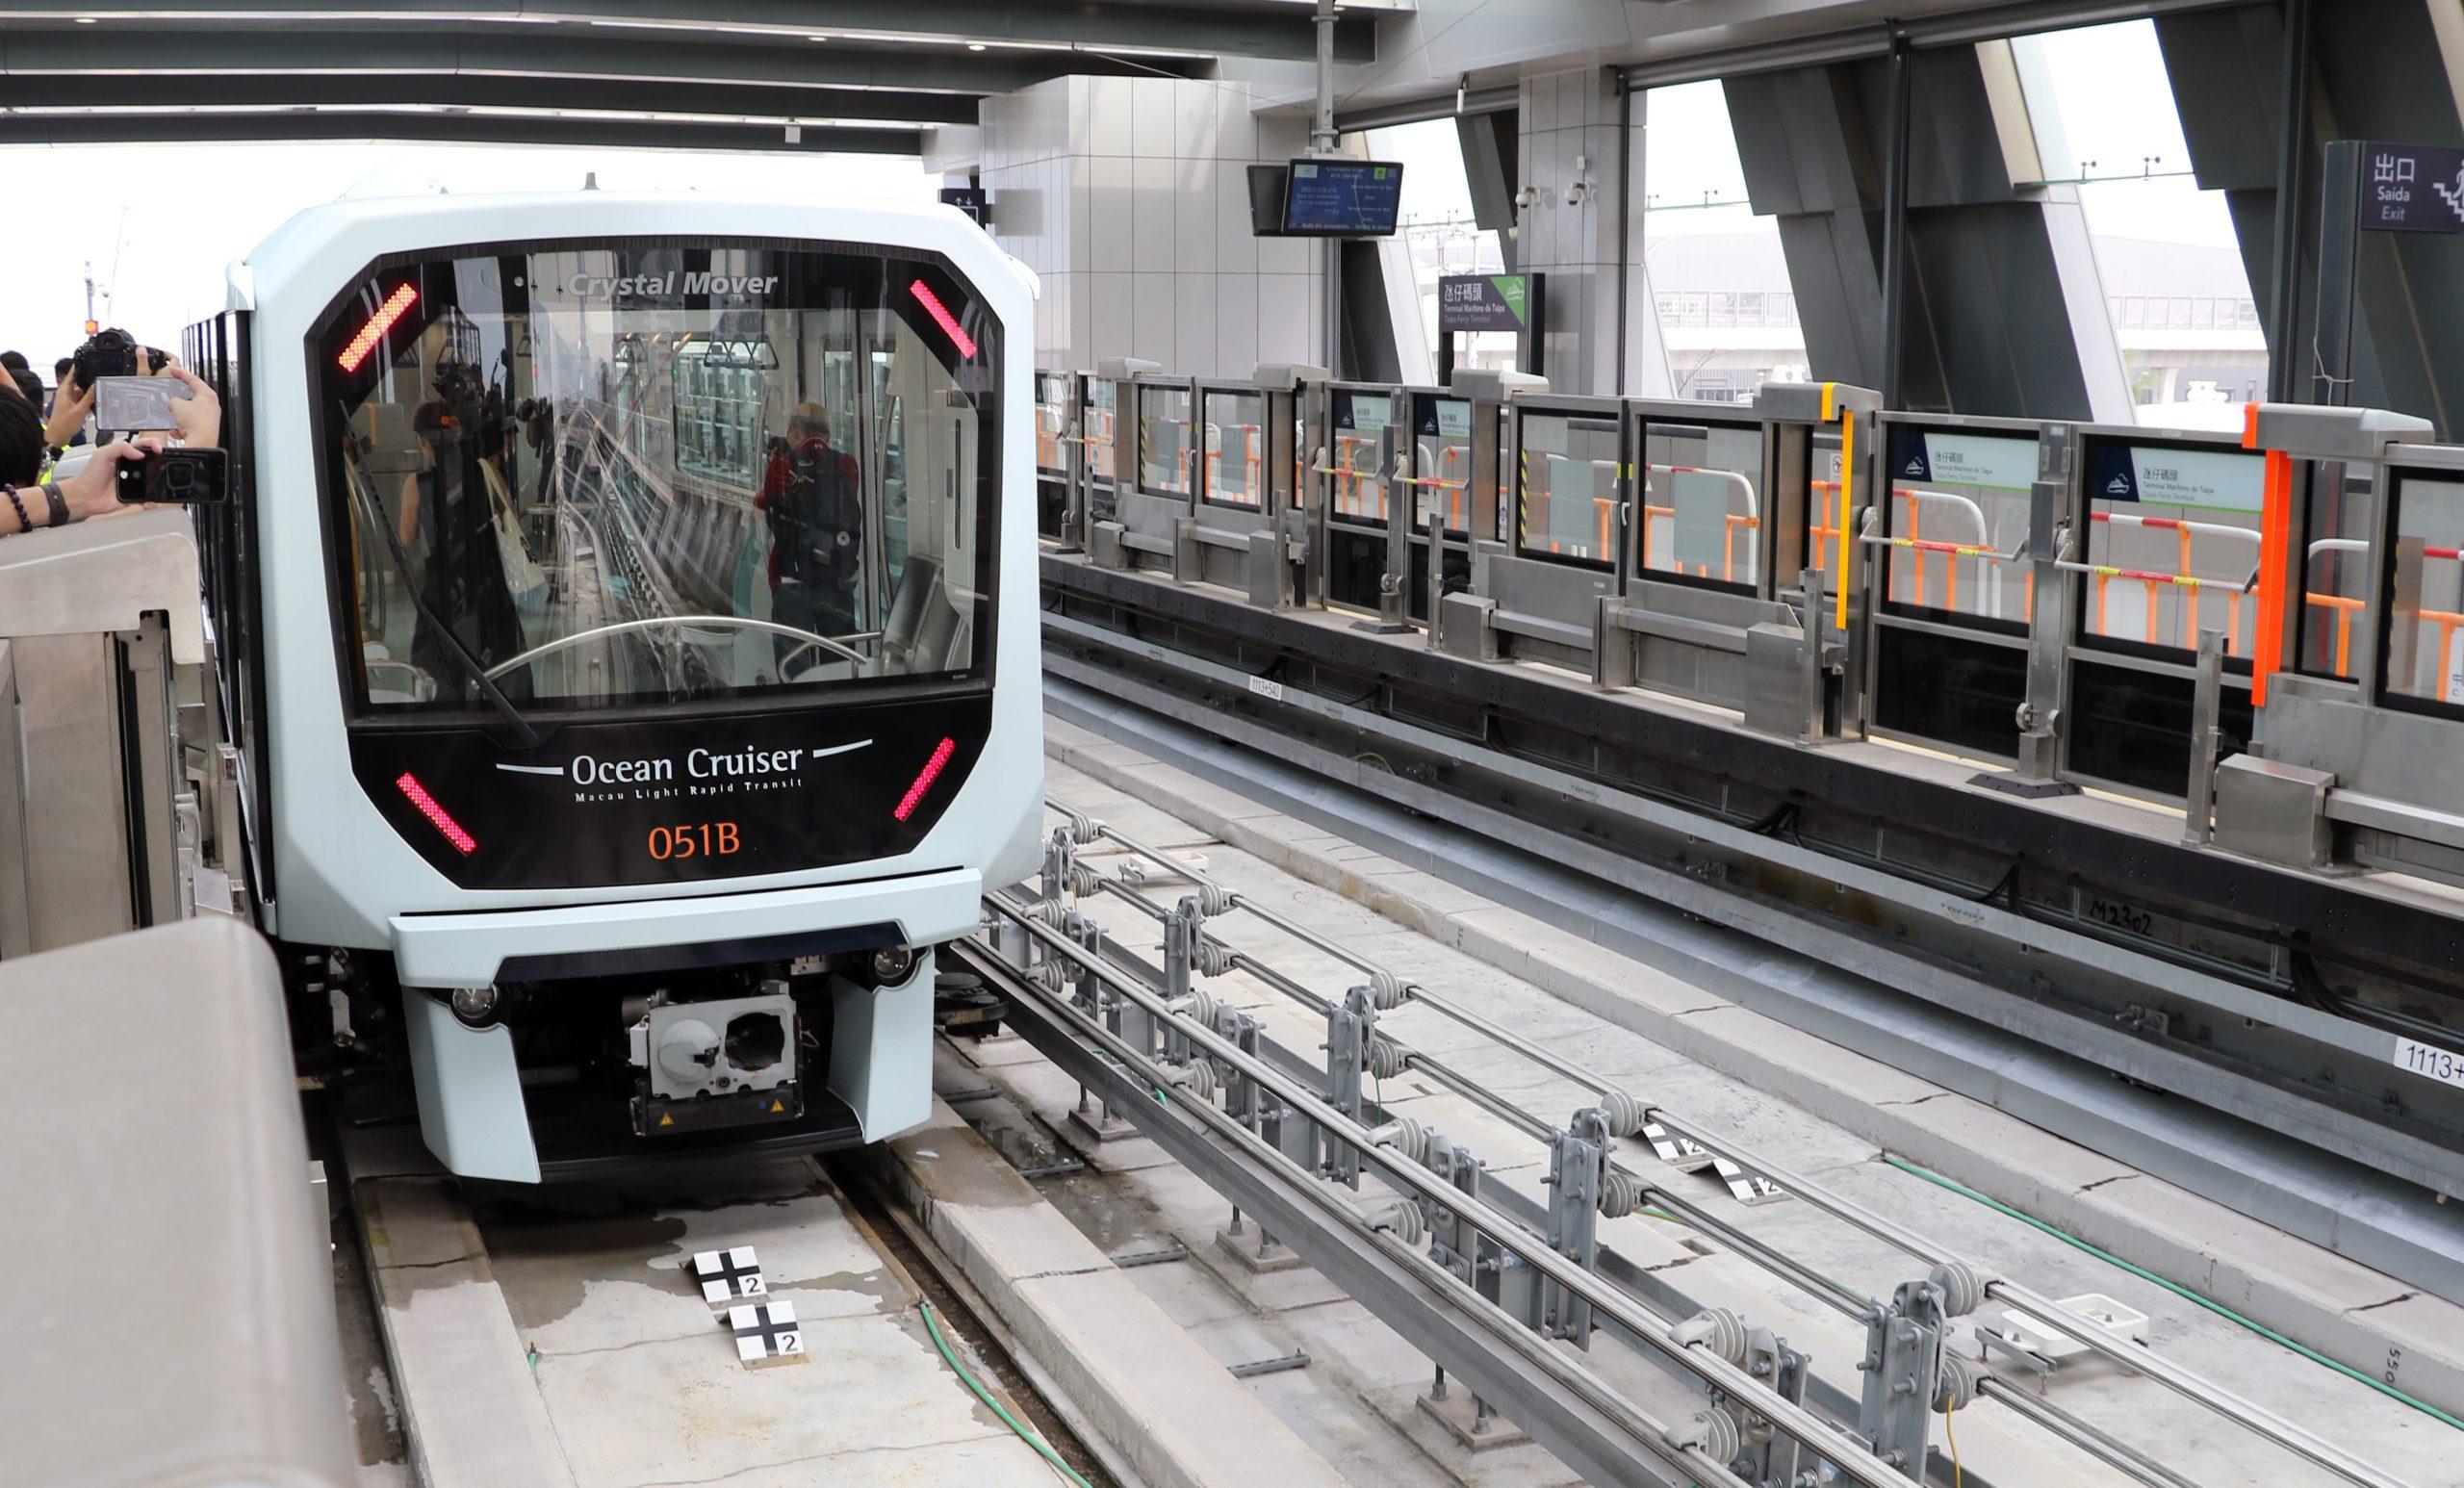 Hengqin Macao LRT